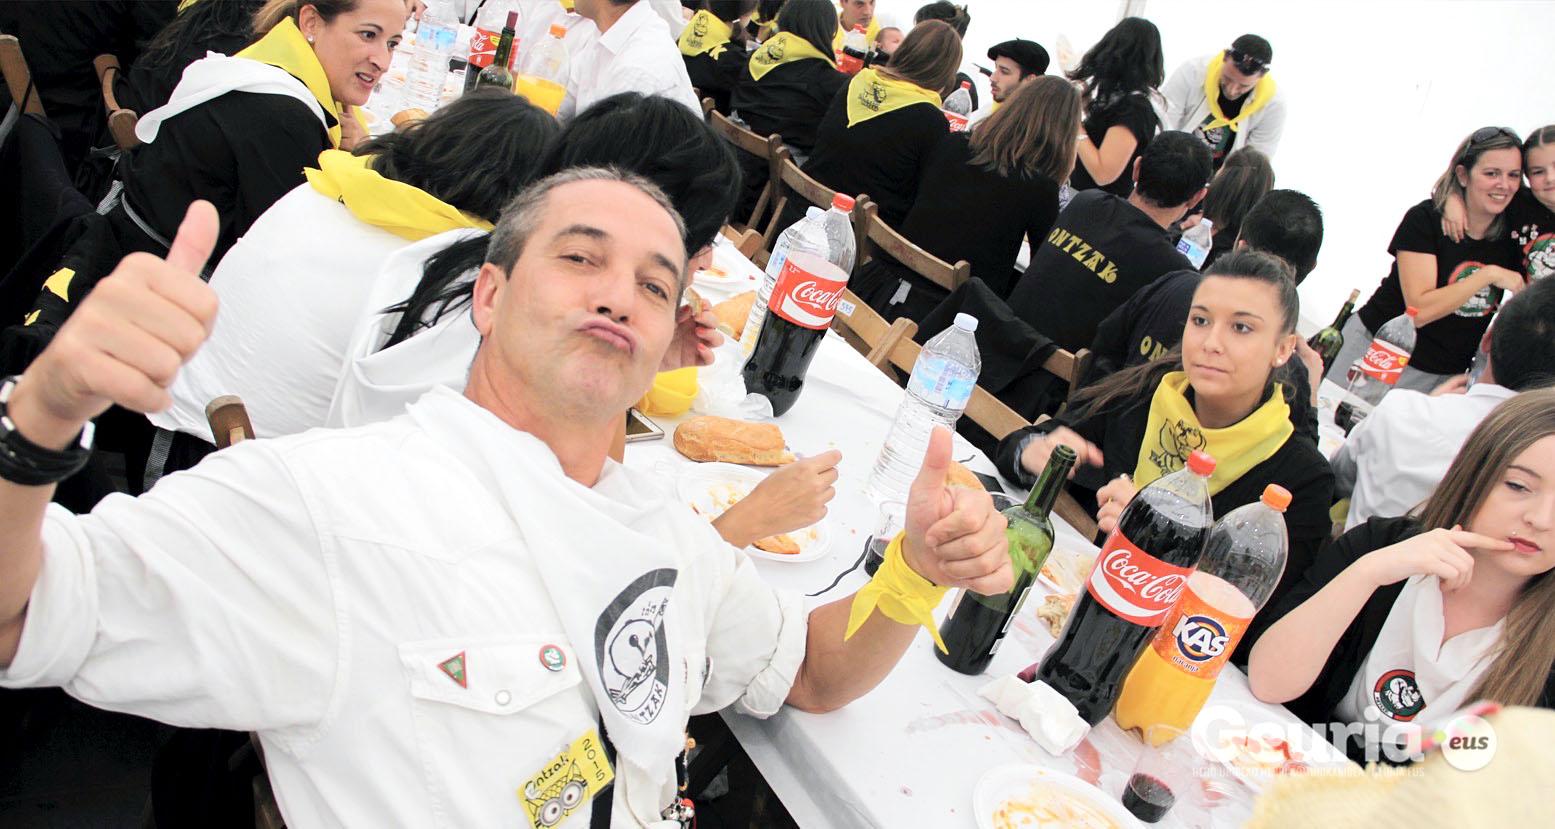 basauri_san_fausto_2015_comida_cuadrilla_43